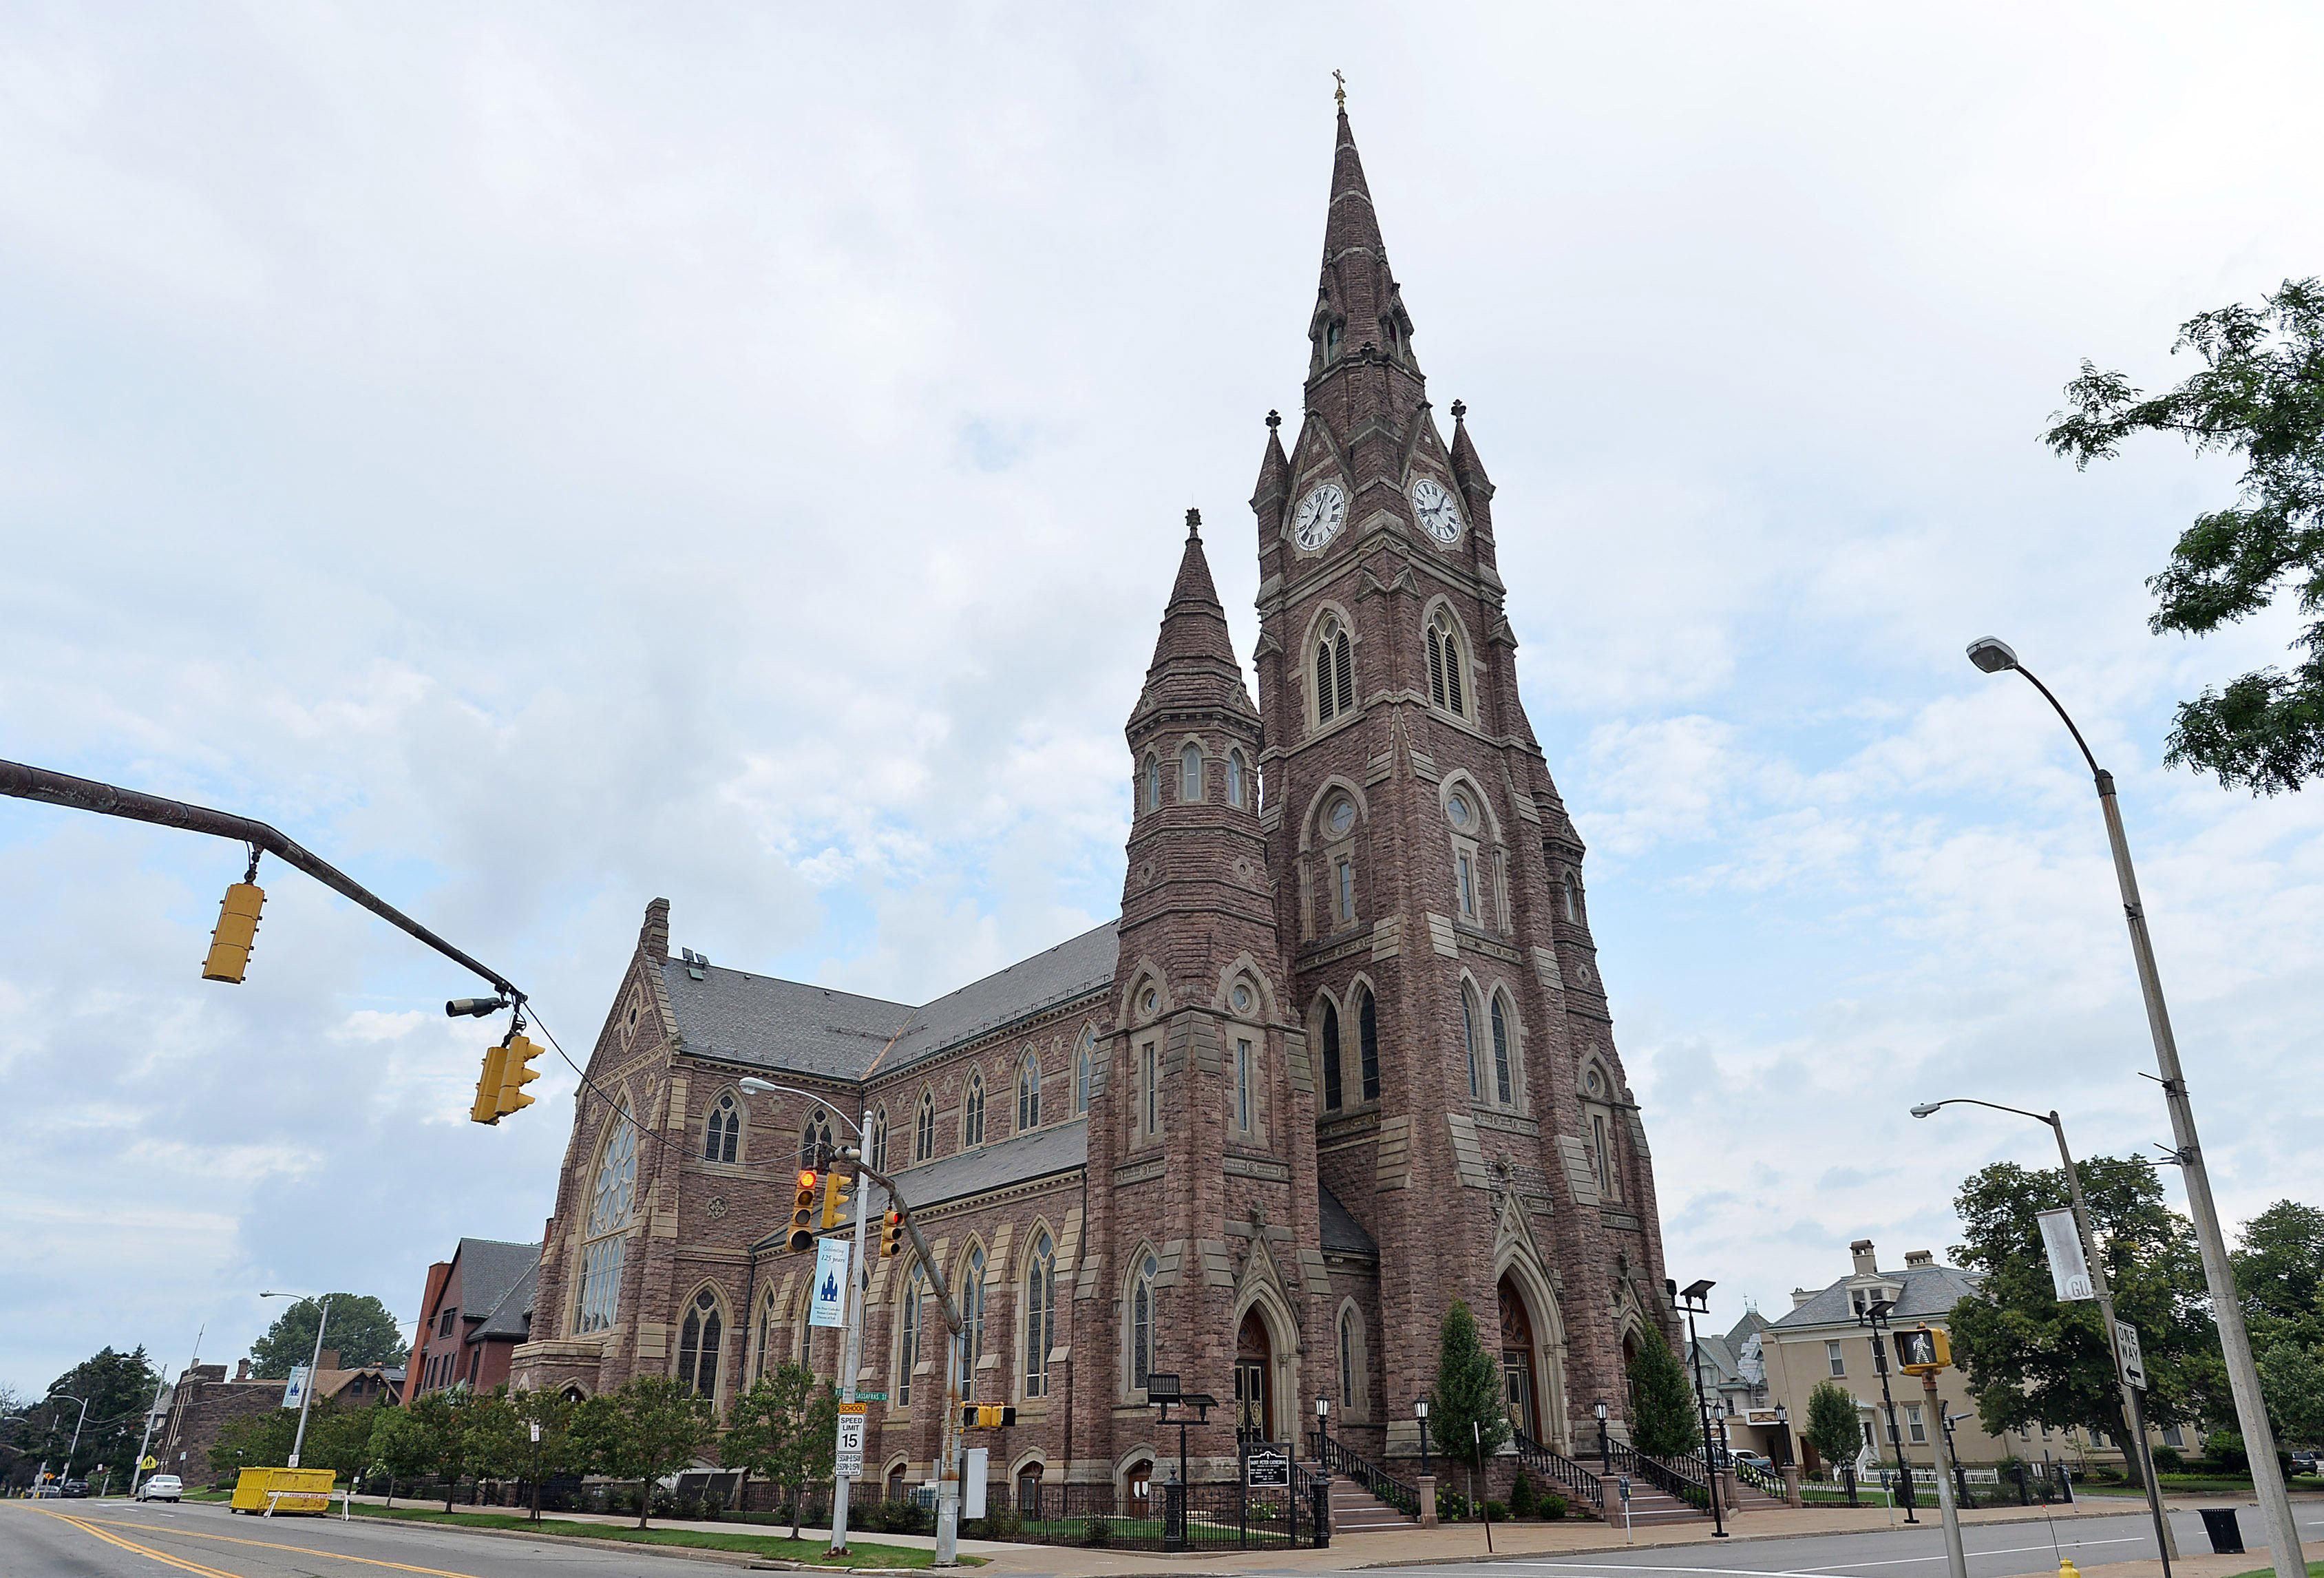 bostonglobe.com - Reese Dunklin - After lobbying, Catholic Church won $1.4 billion in virus aid